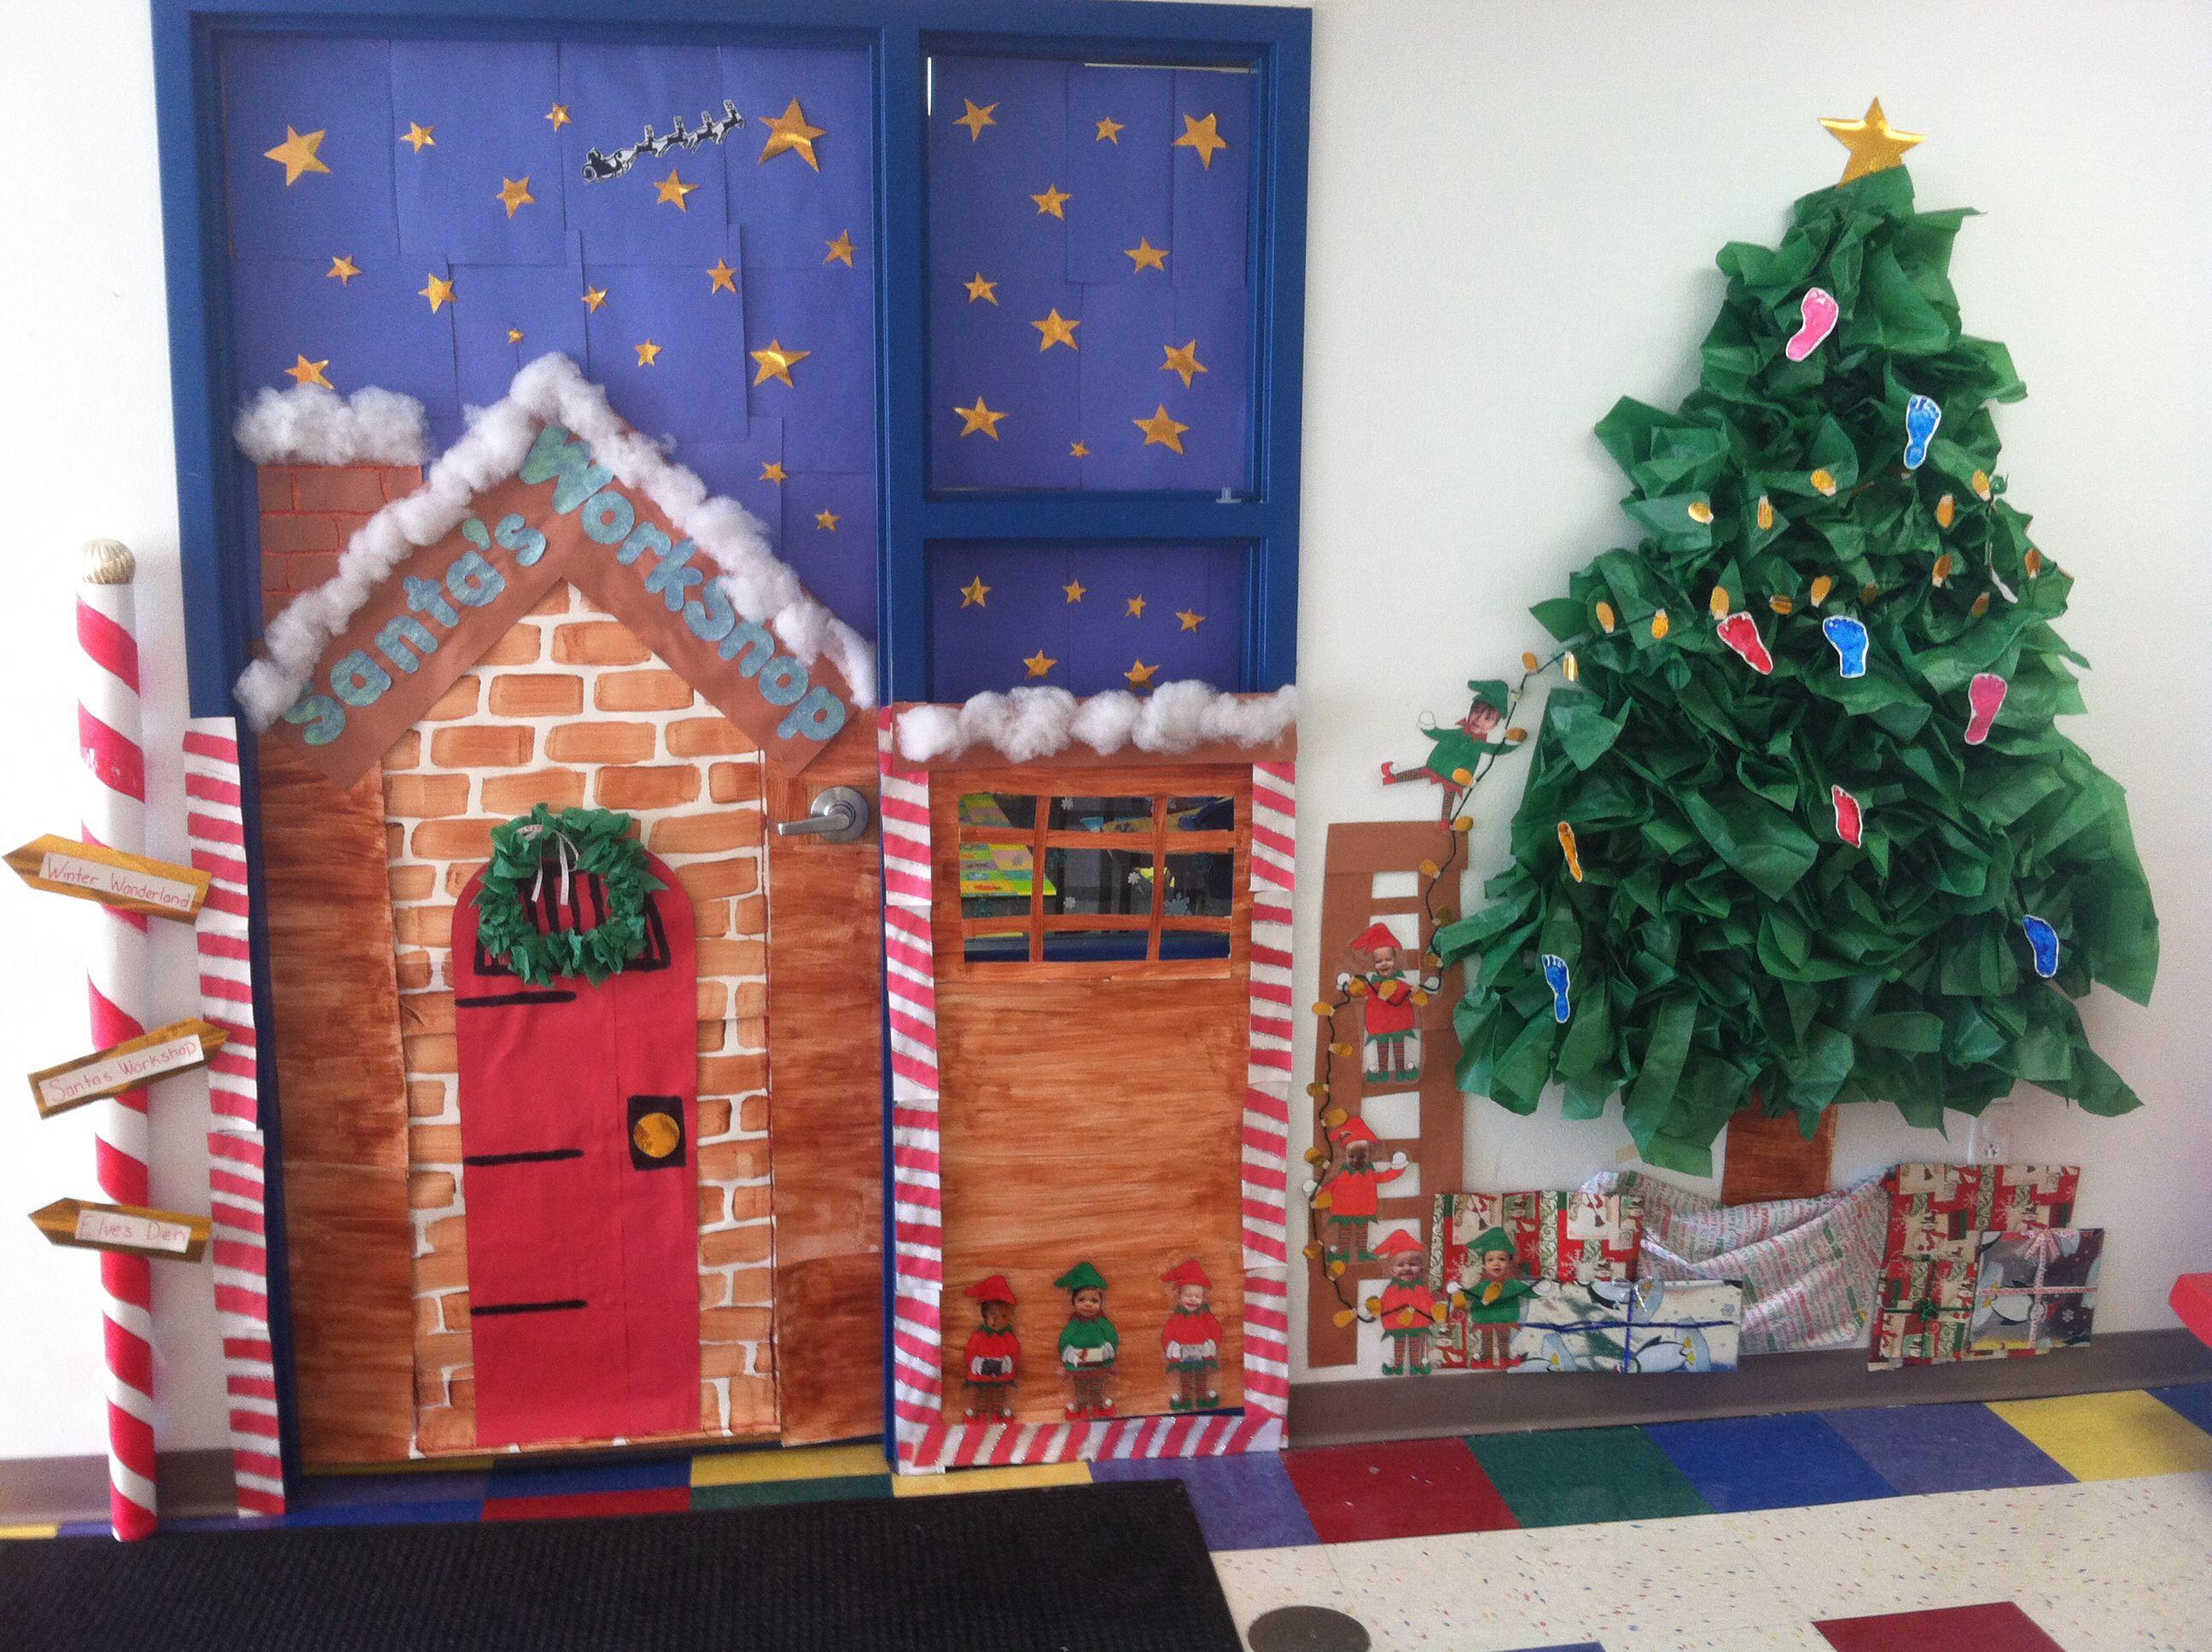 Santas Workshop Decorations